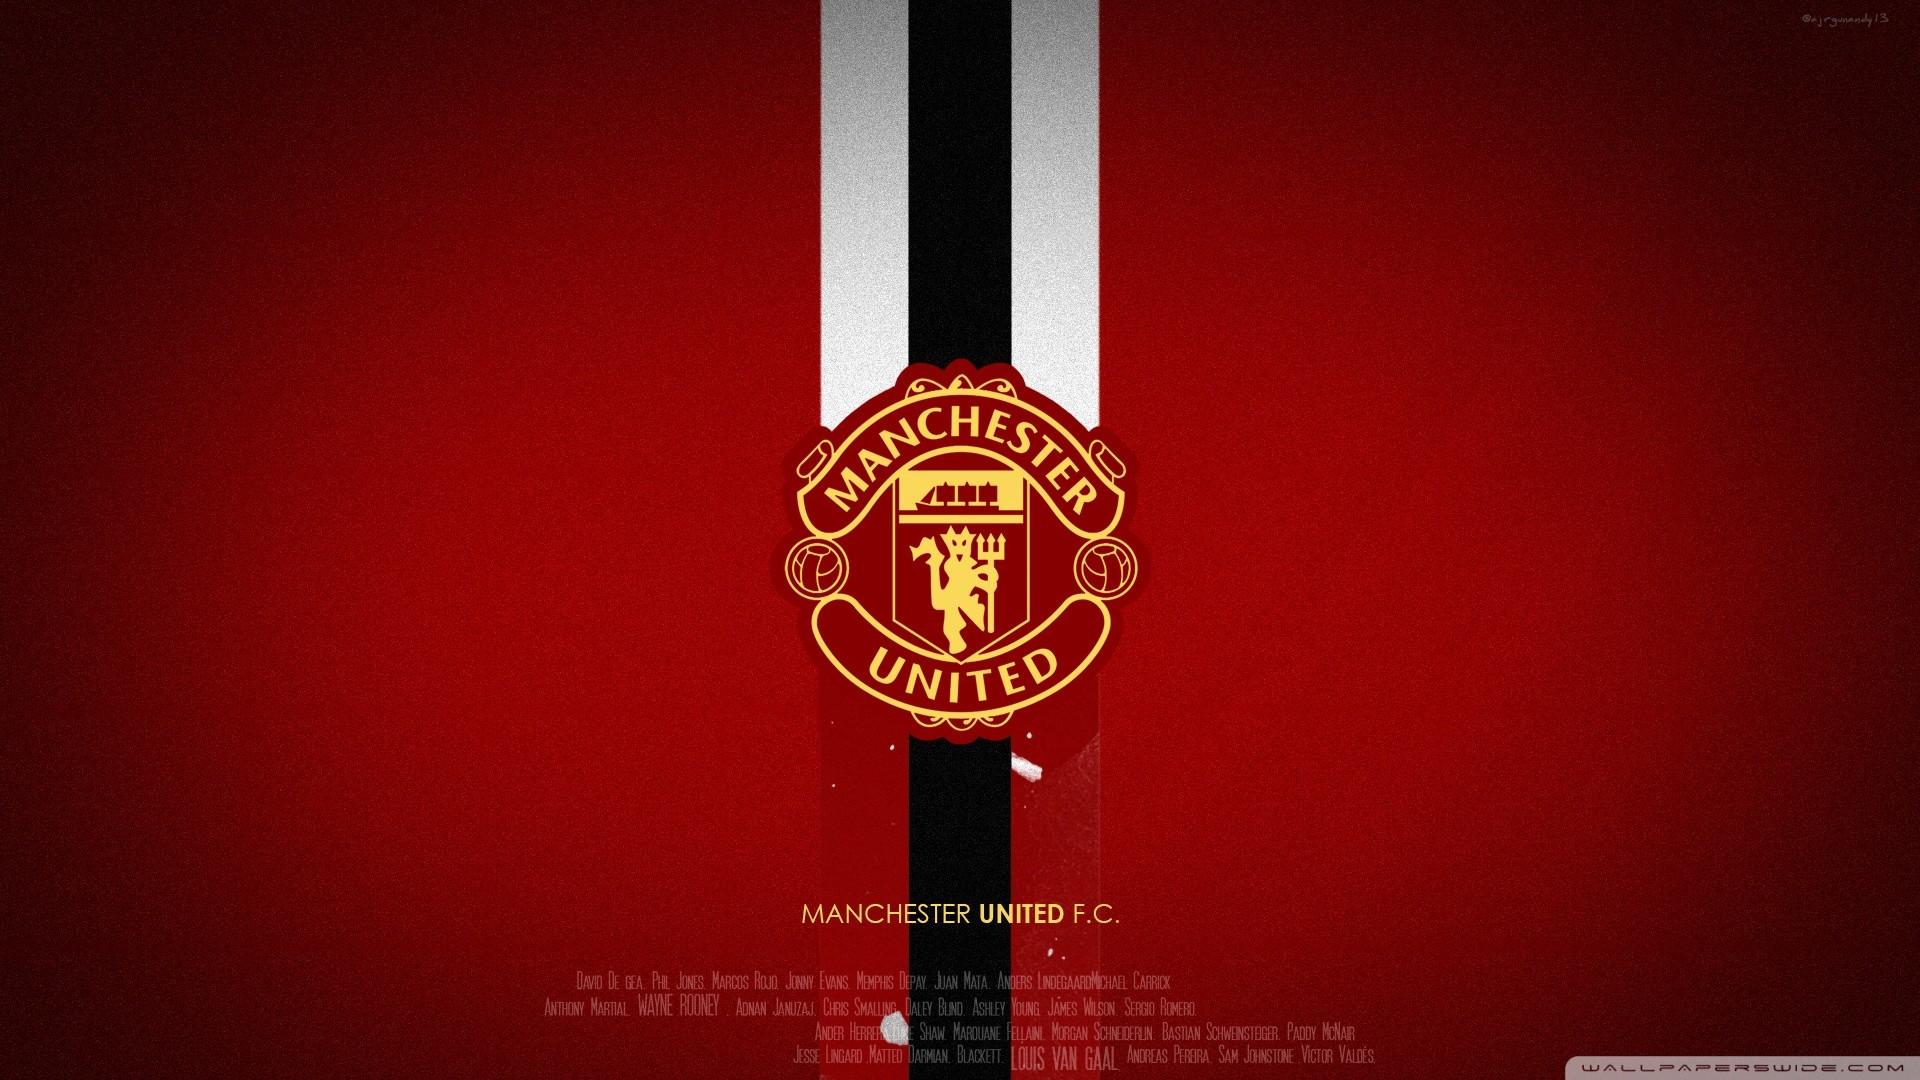 … manchester united wallpaper 1080p the best football hd …